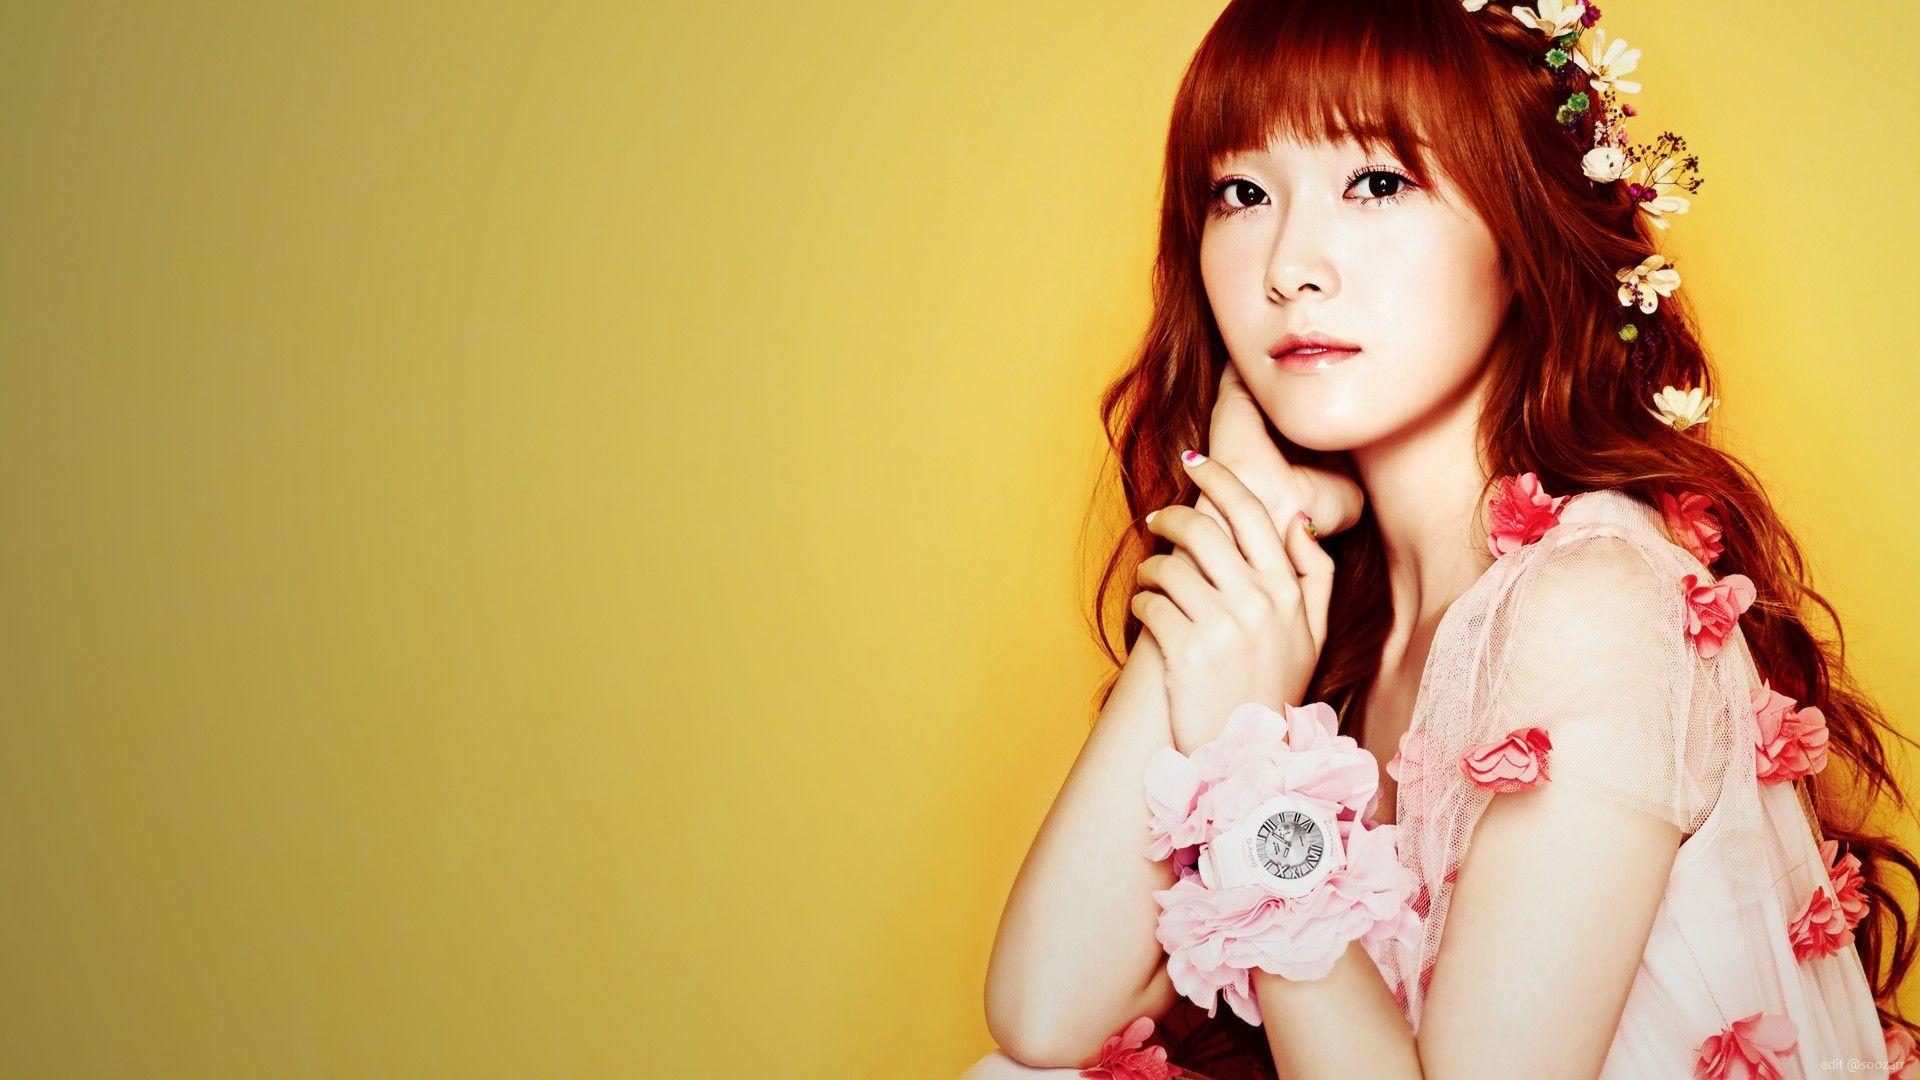 Snsd Jessica 2013